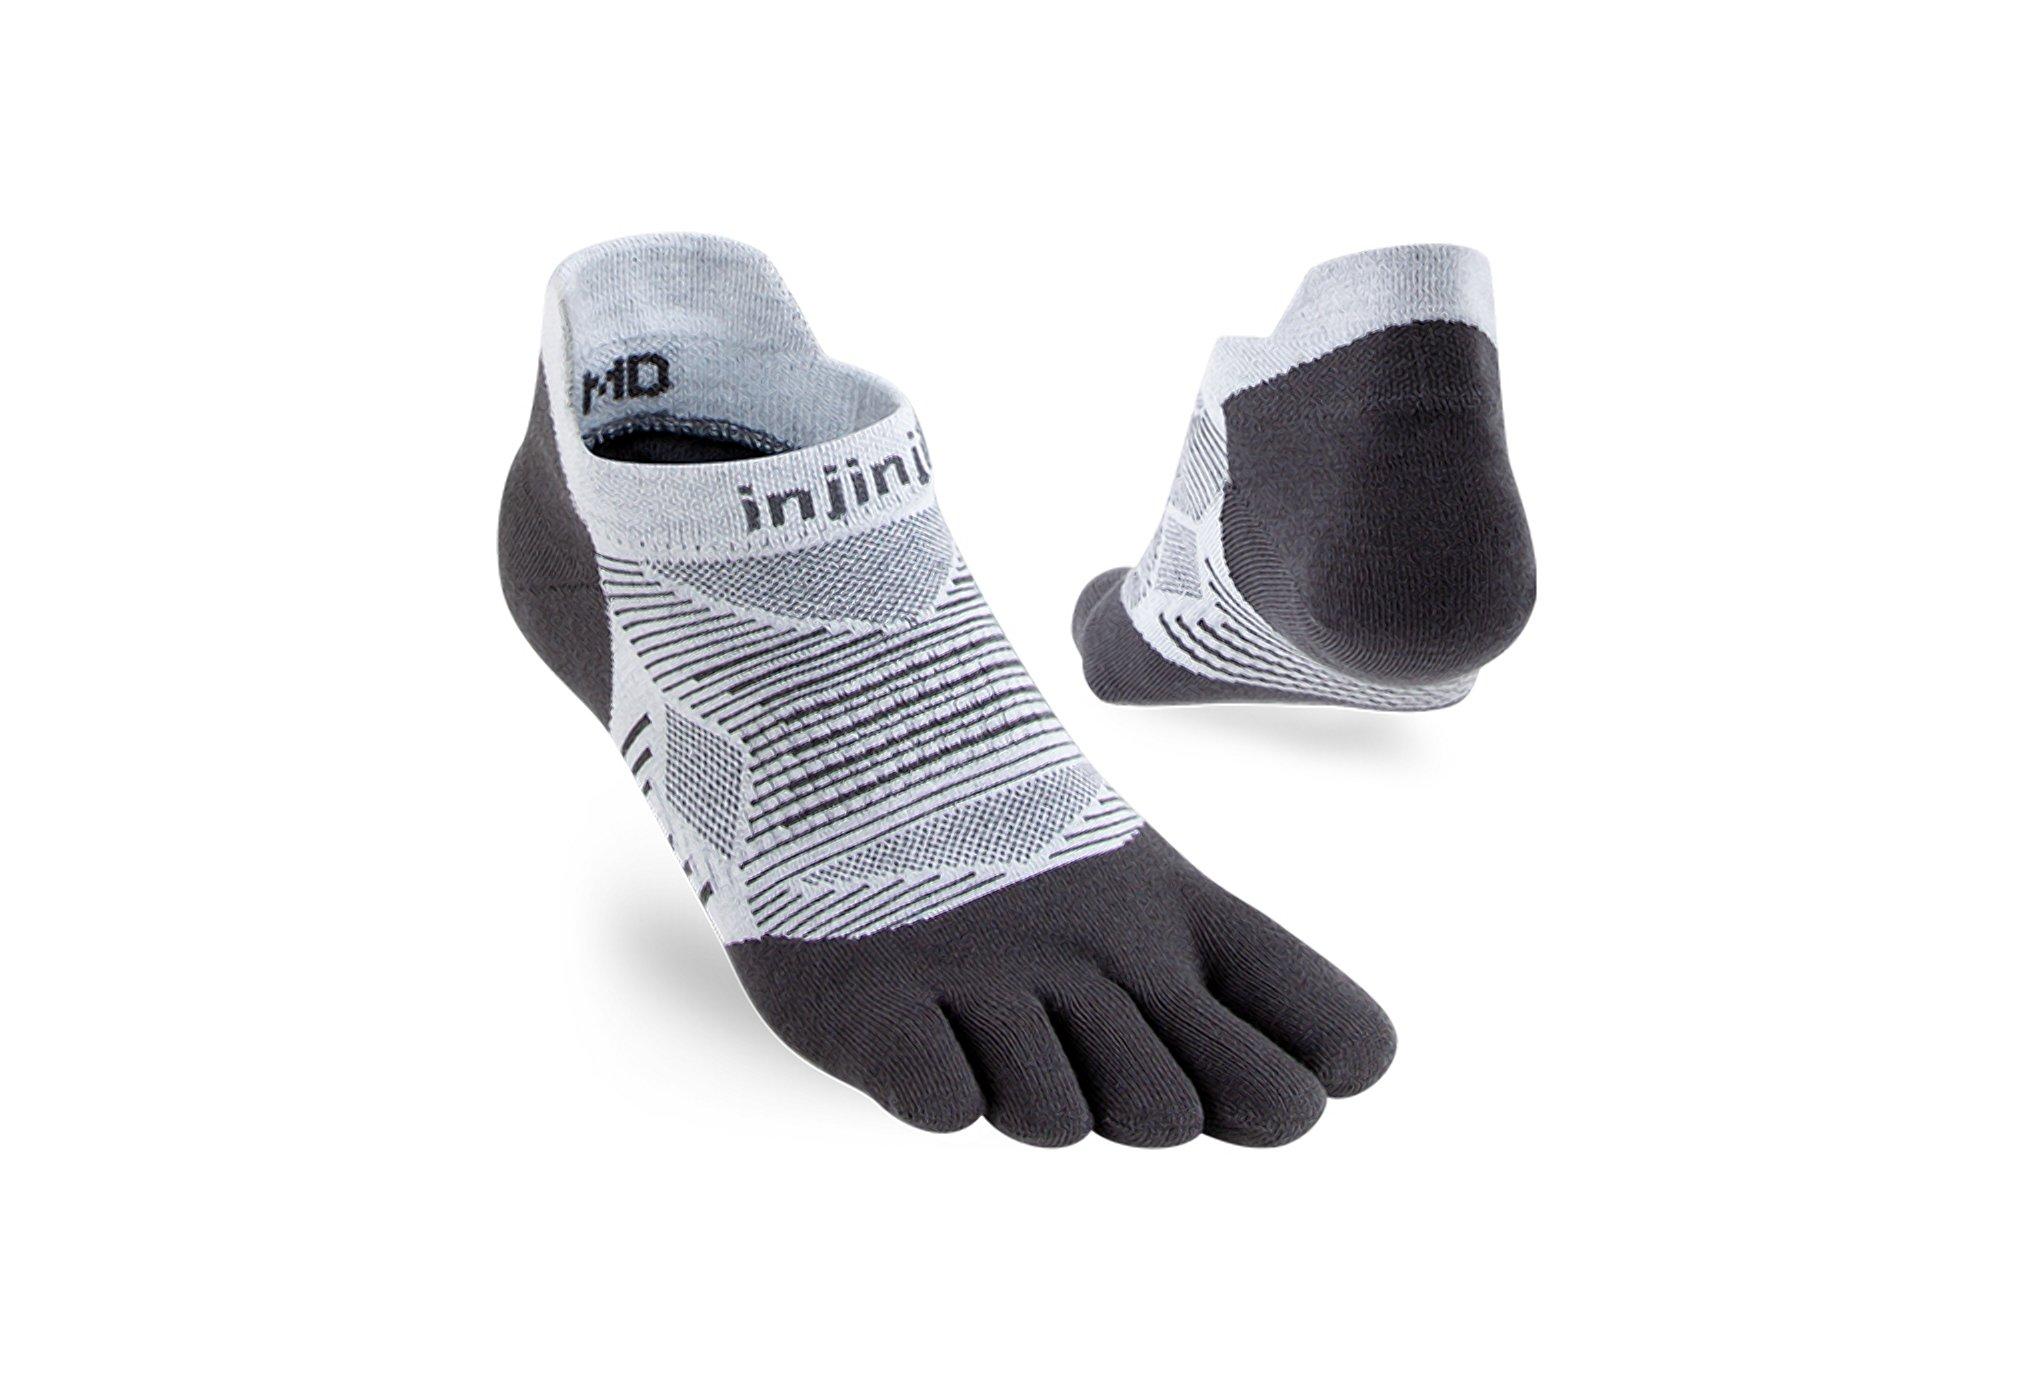 Injinji Run Original Weight No-Show Coolmax Chaussettes